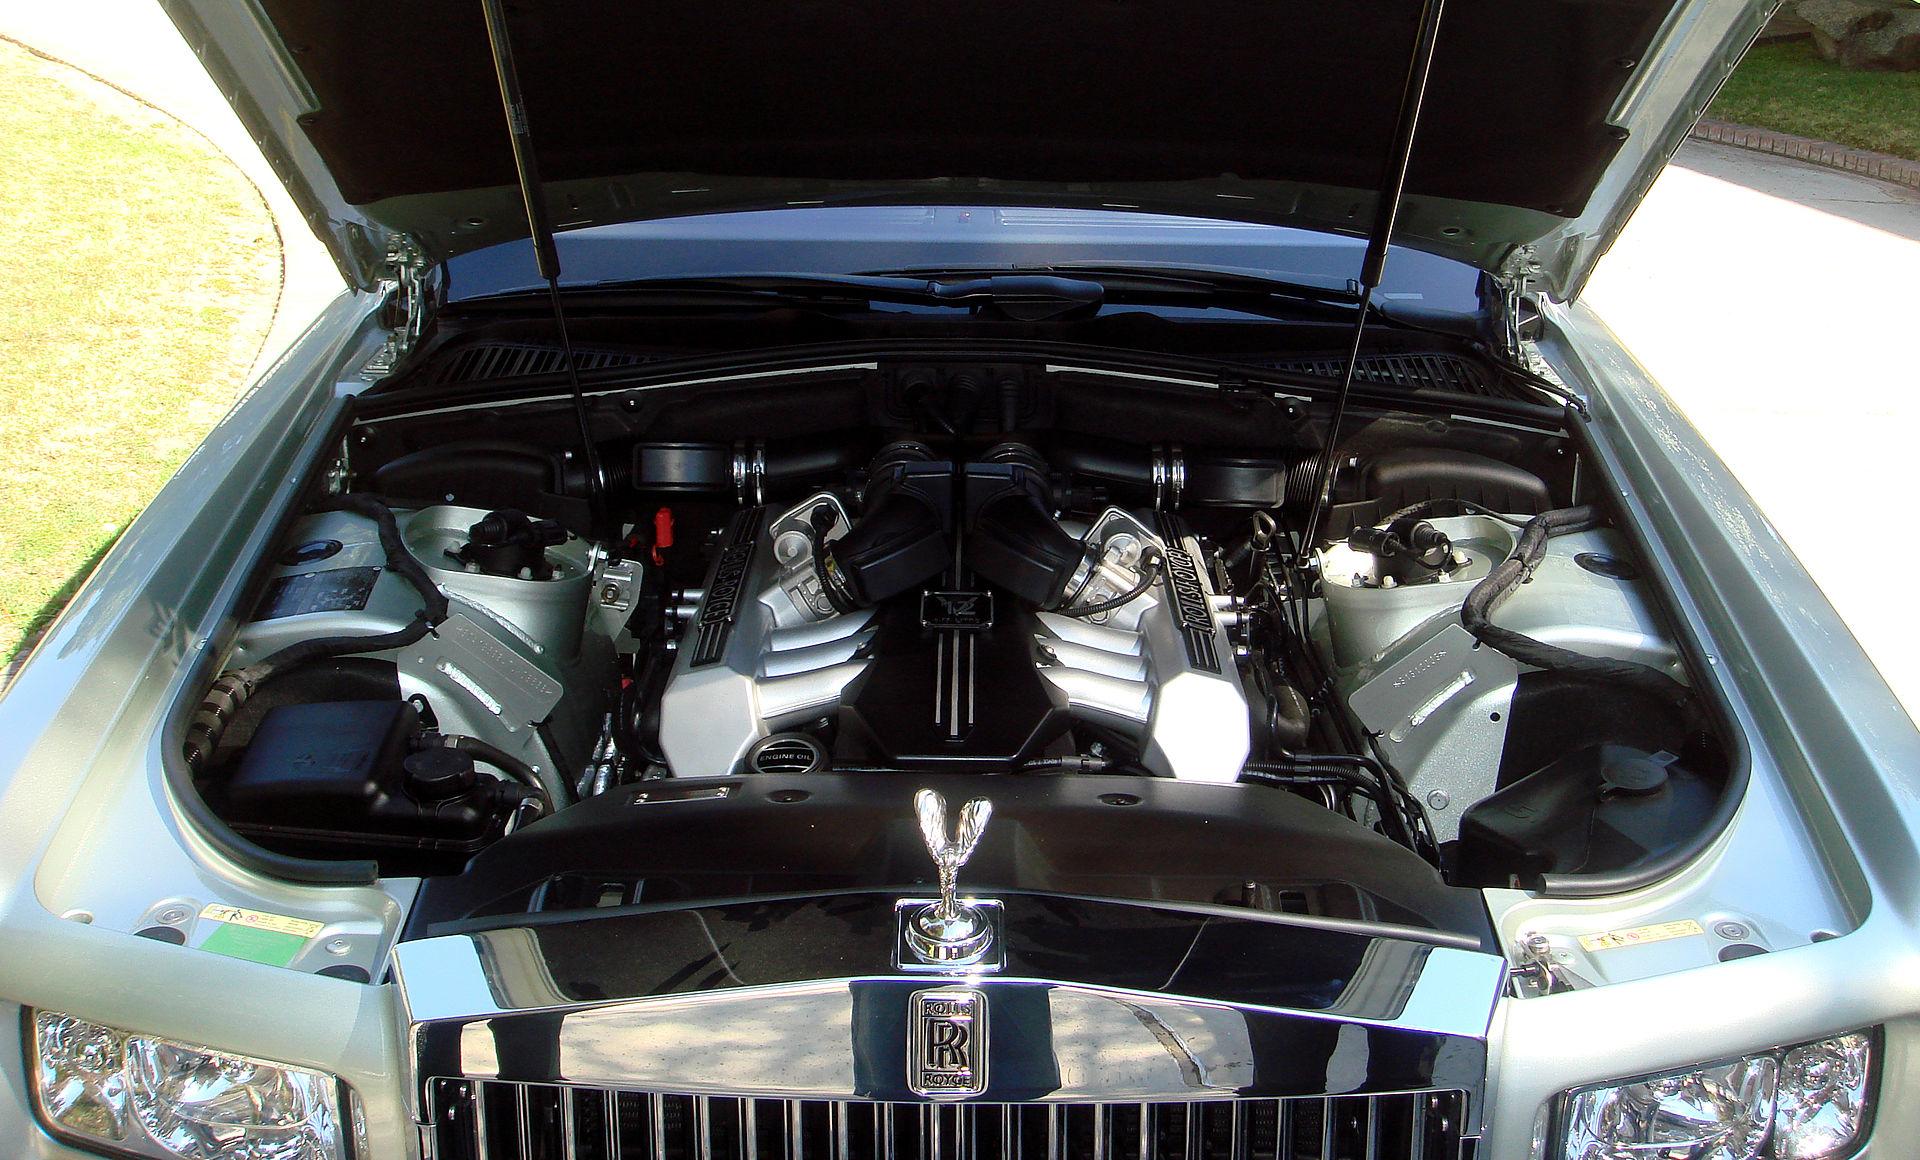 Rolls royce phantom 2003 wikipedia for Rolls royce phantom motor